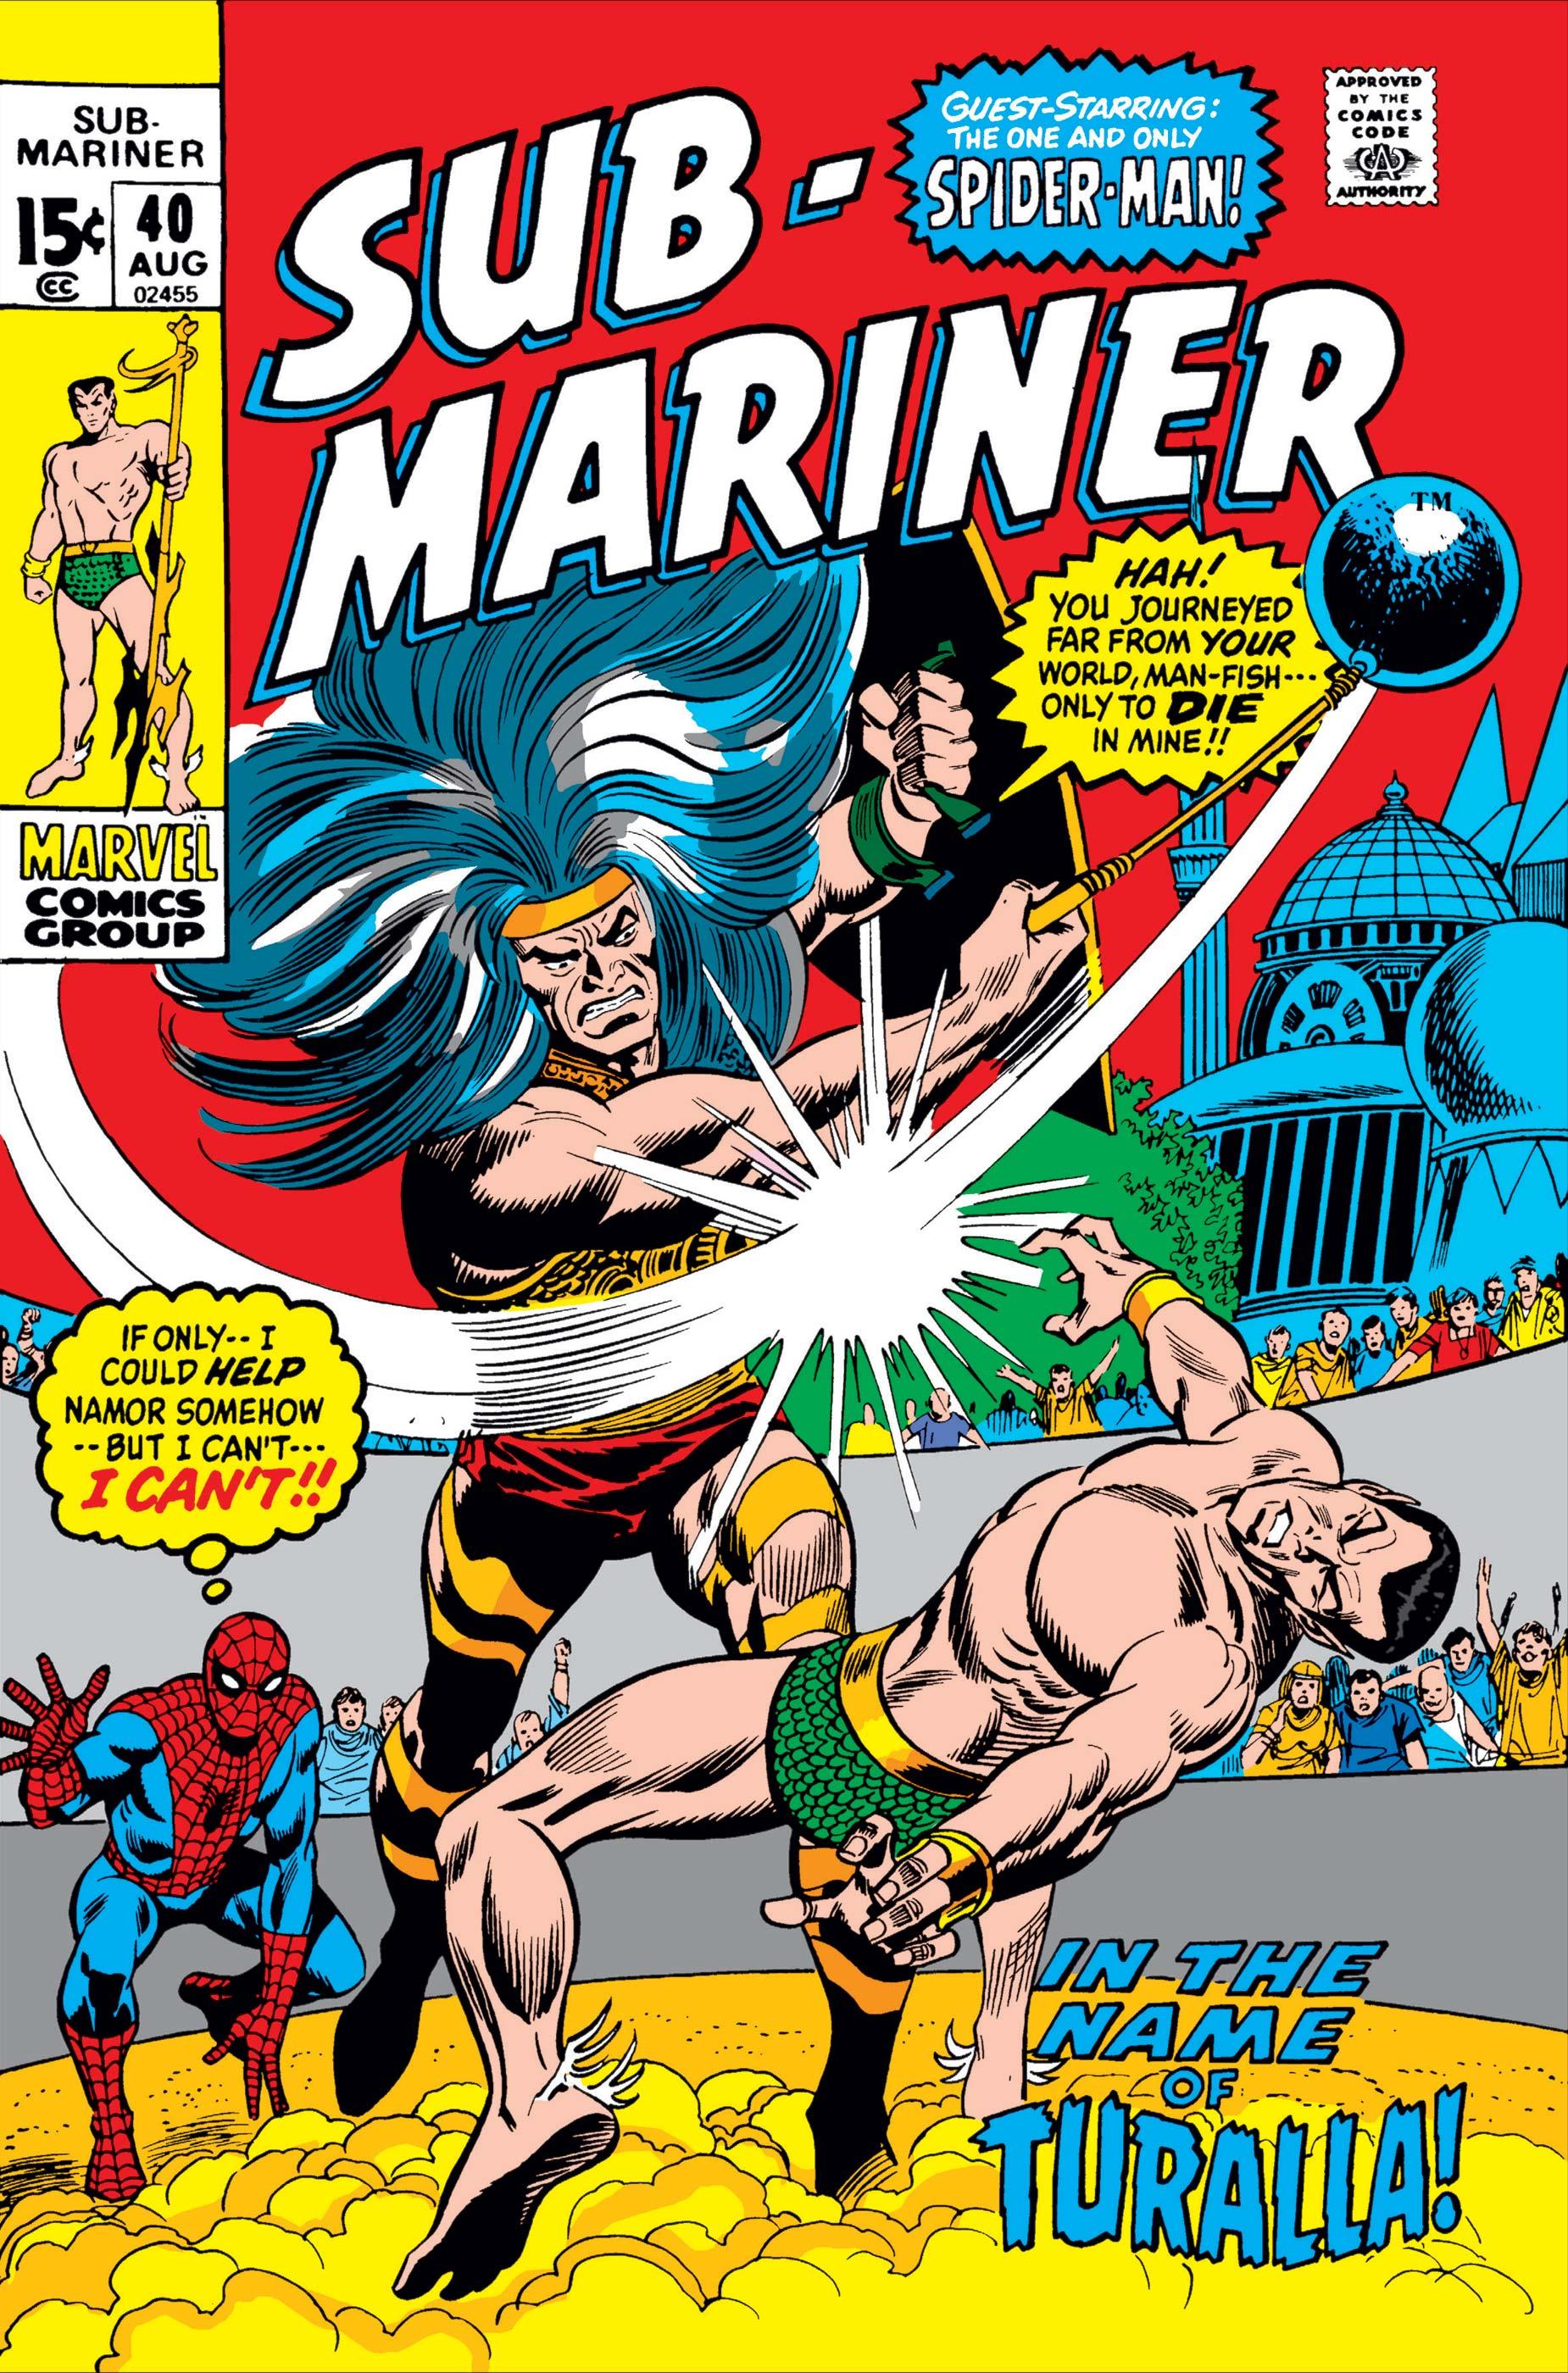 Sub-Mariner (1968) #40